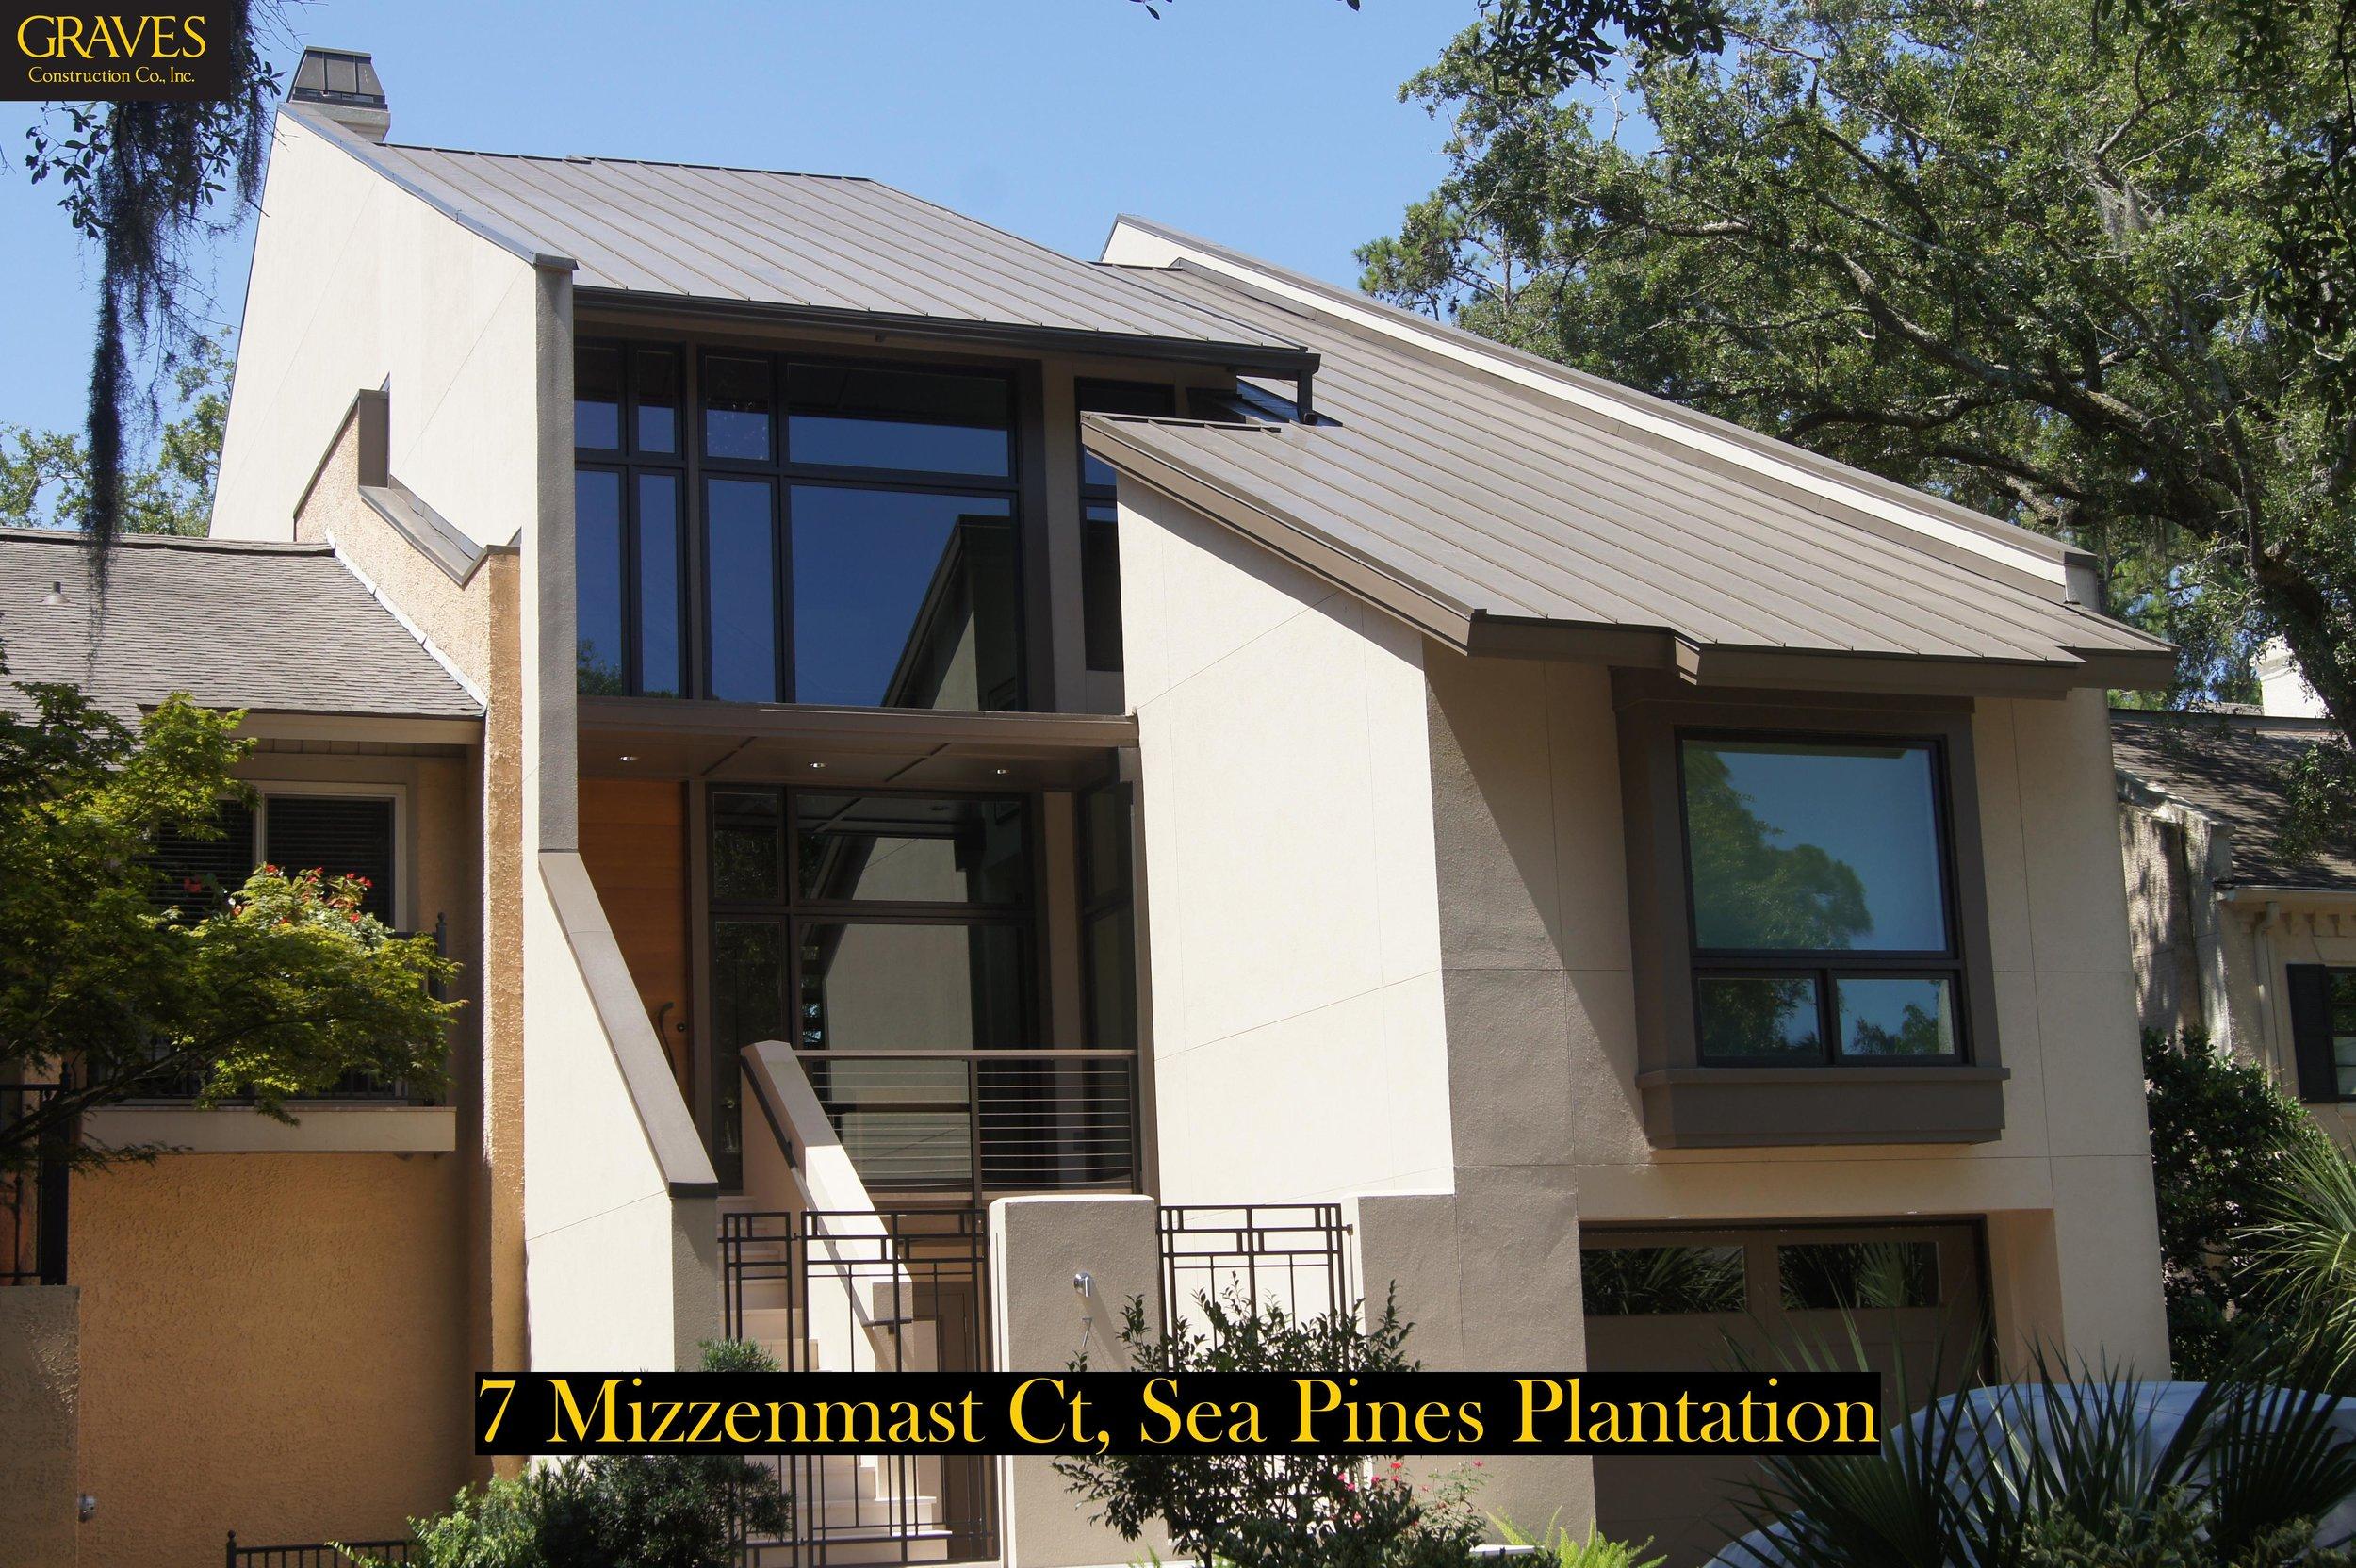 7 Mizzenmast Ct. - Sea Pines Plantation